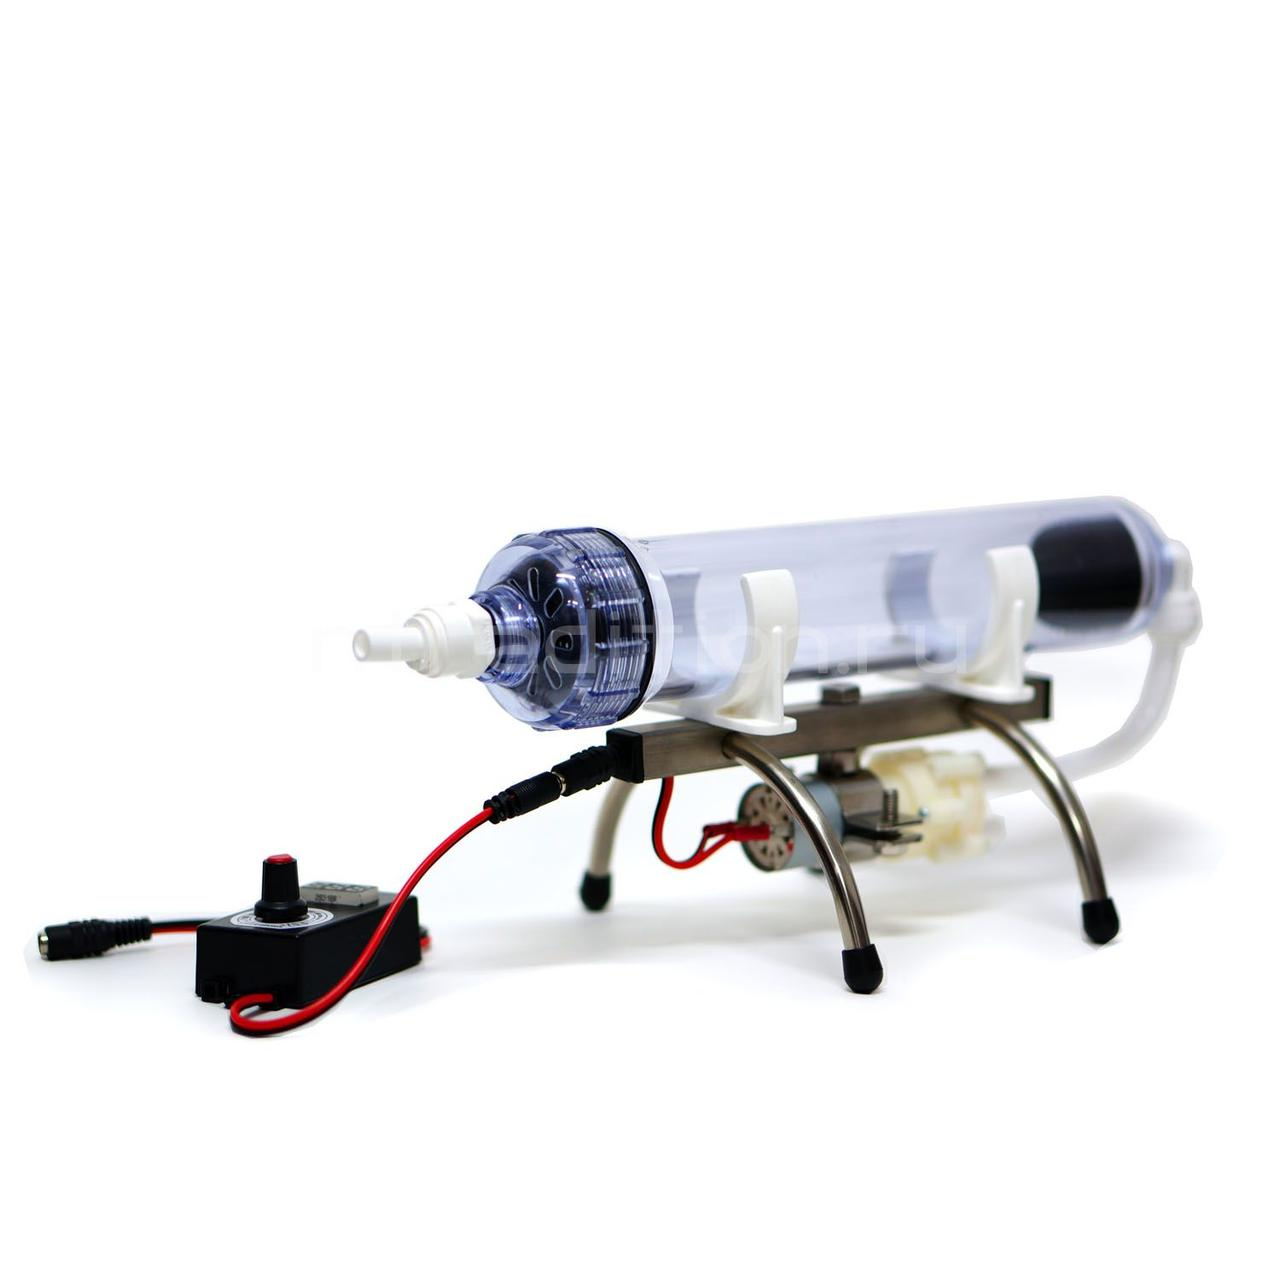 "Фильтрующее устройство ""Дистив IL-10"" + регулятор напряжения"